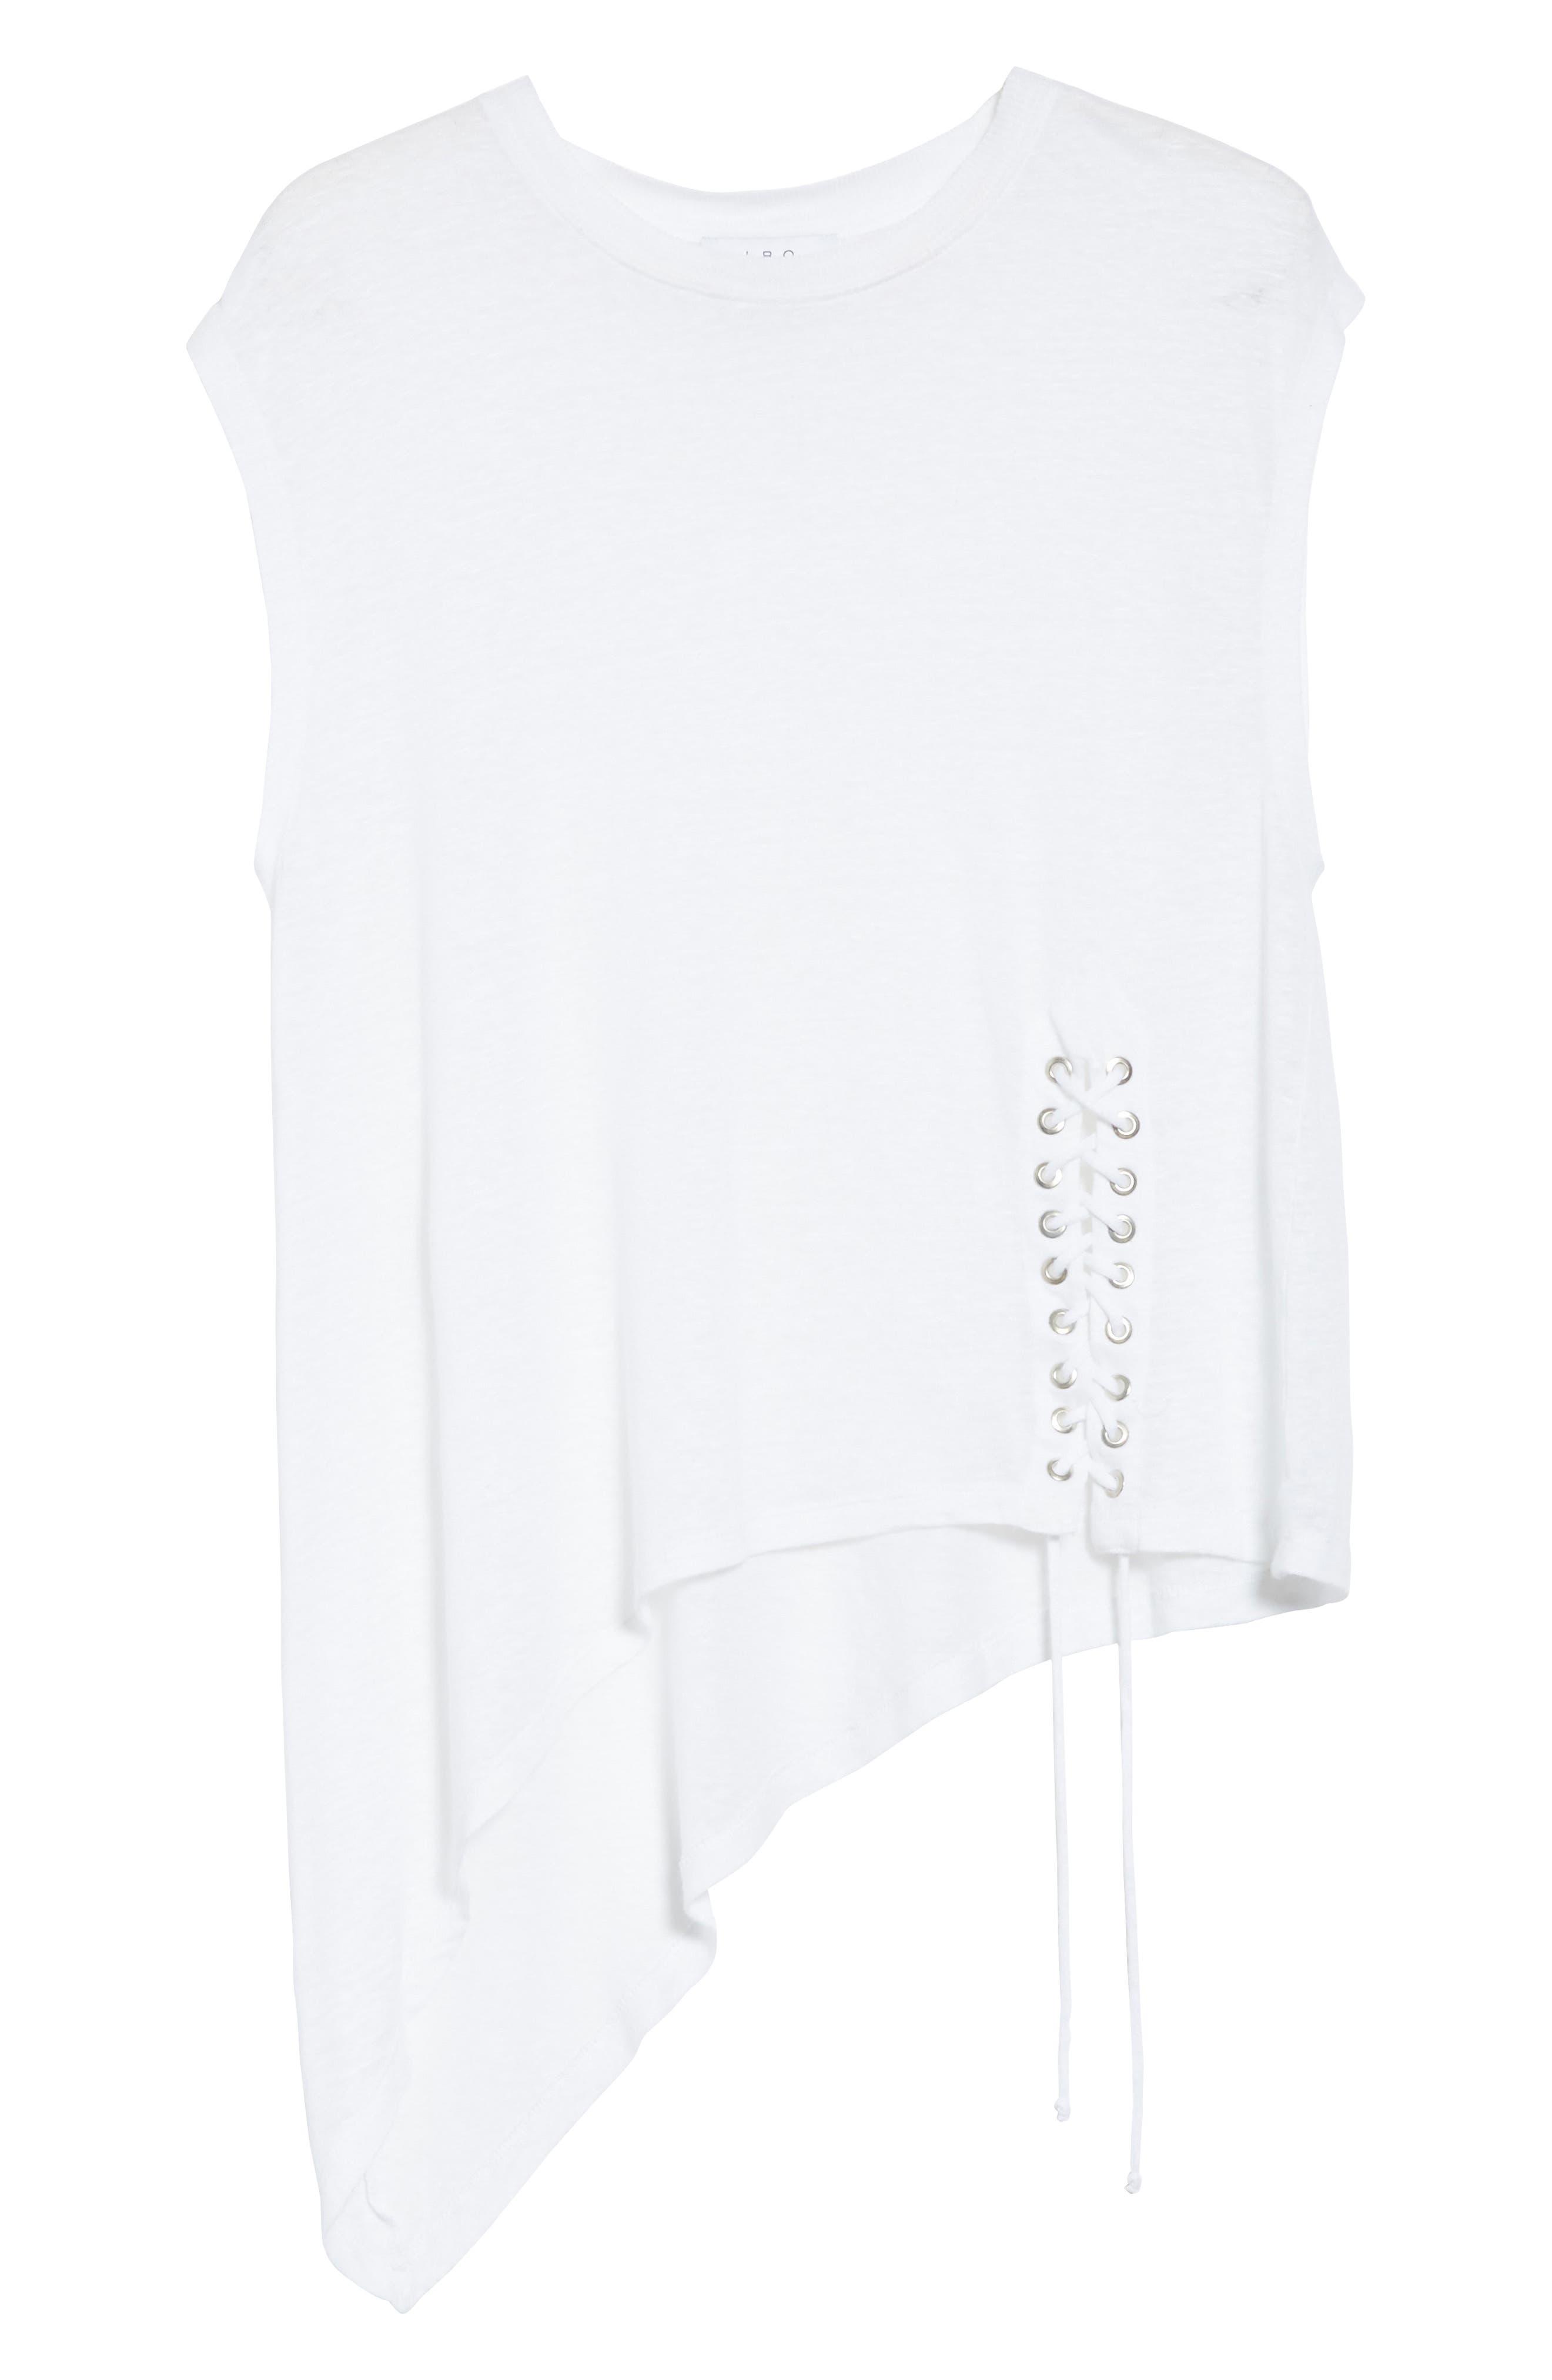 Karami Linen Asymmetrical Lace-Up Top,                             Alternate thumbnail 6, color,                             White